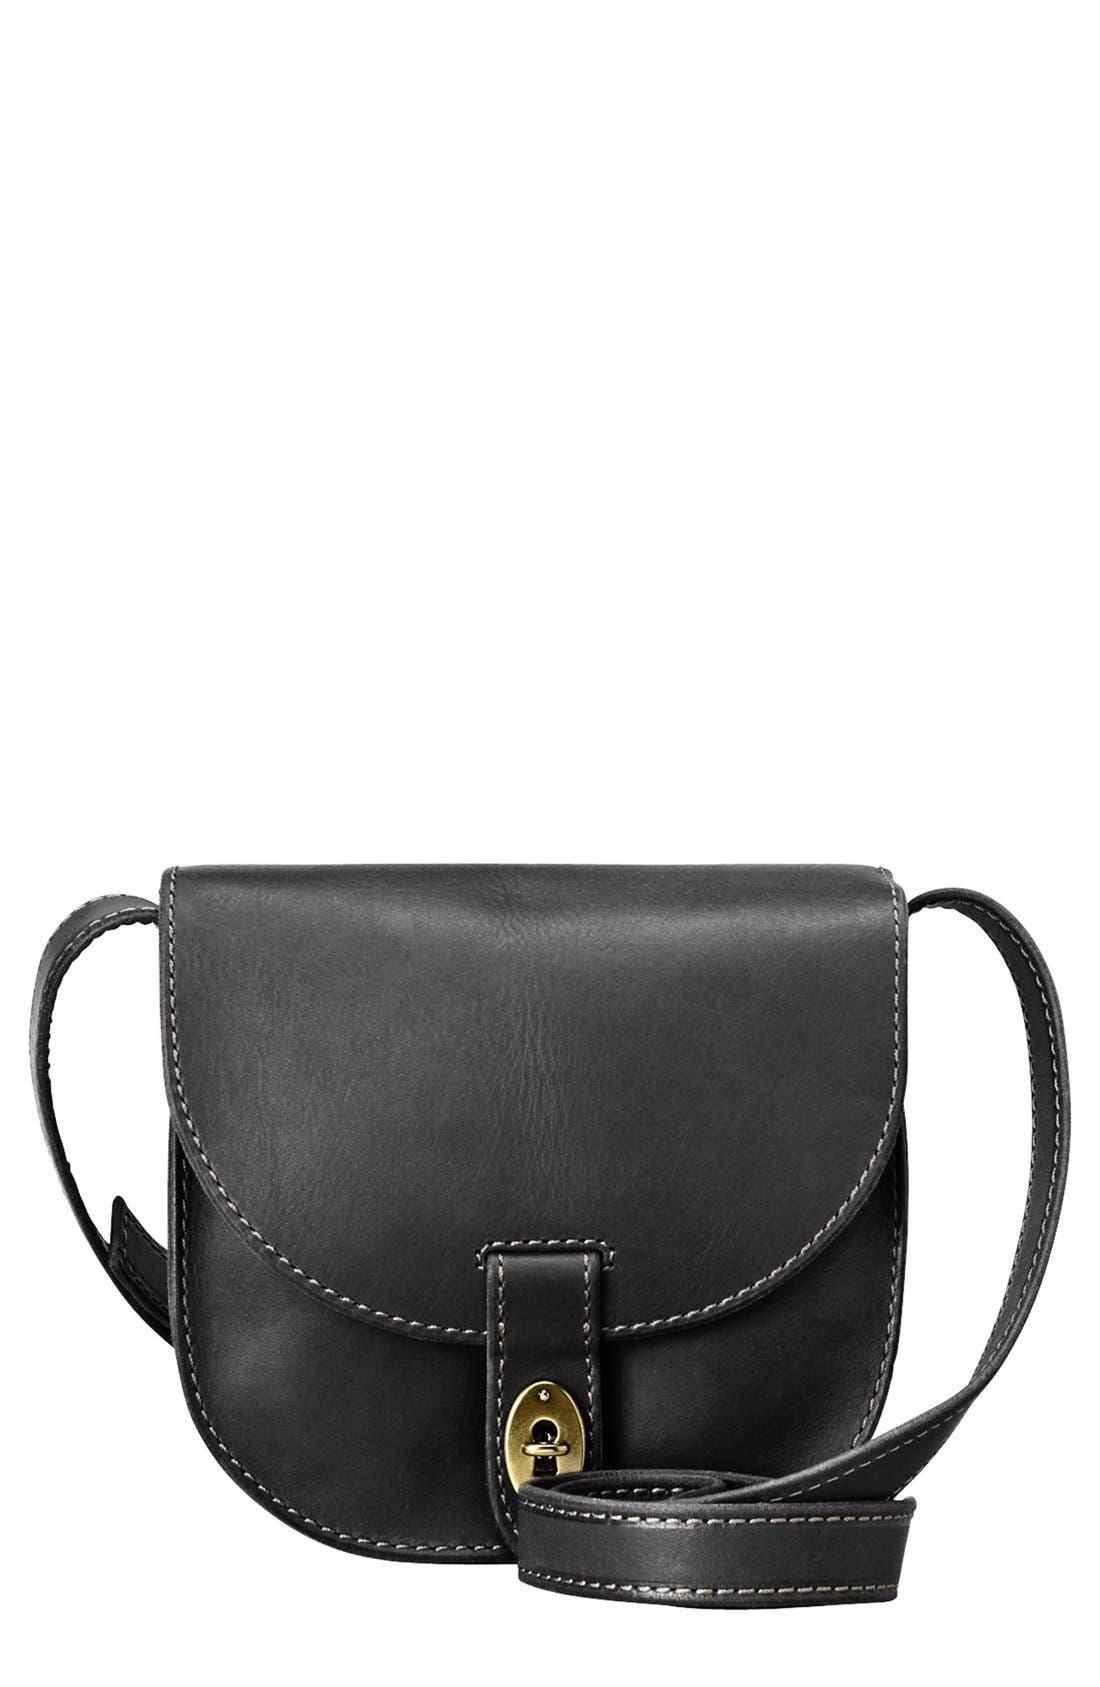 'Austin - Small' Crossbody Bag, Main, color, 001